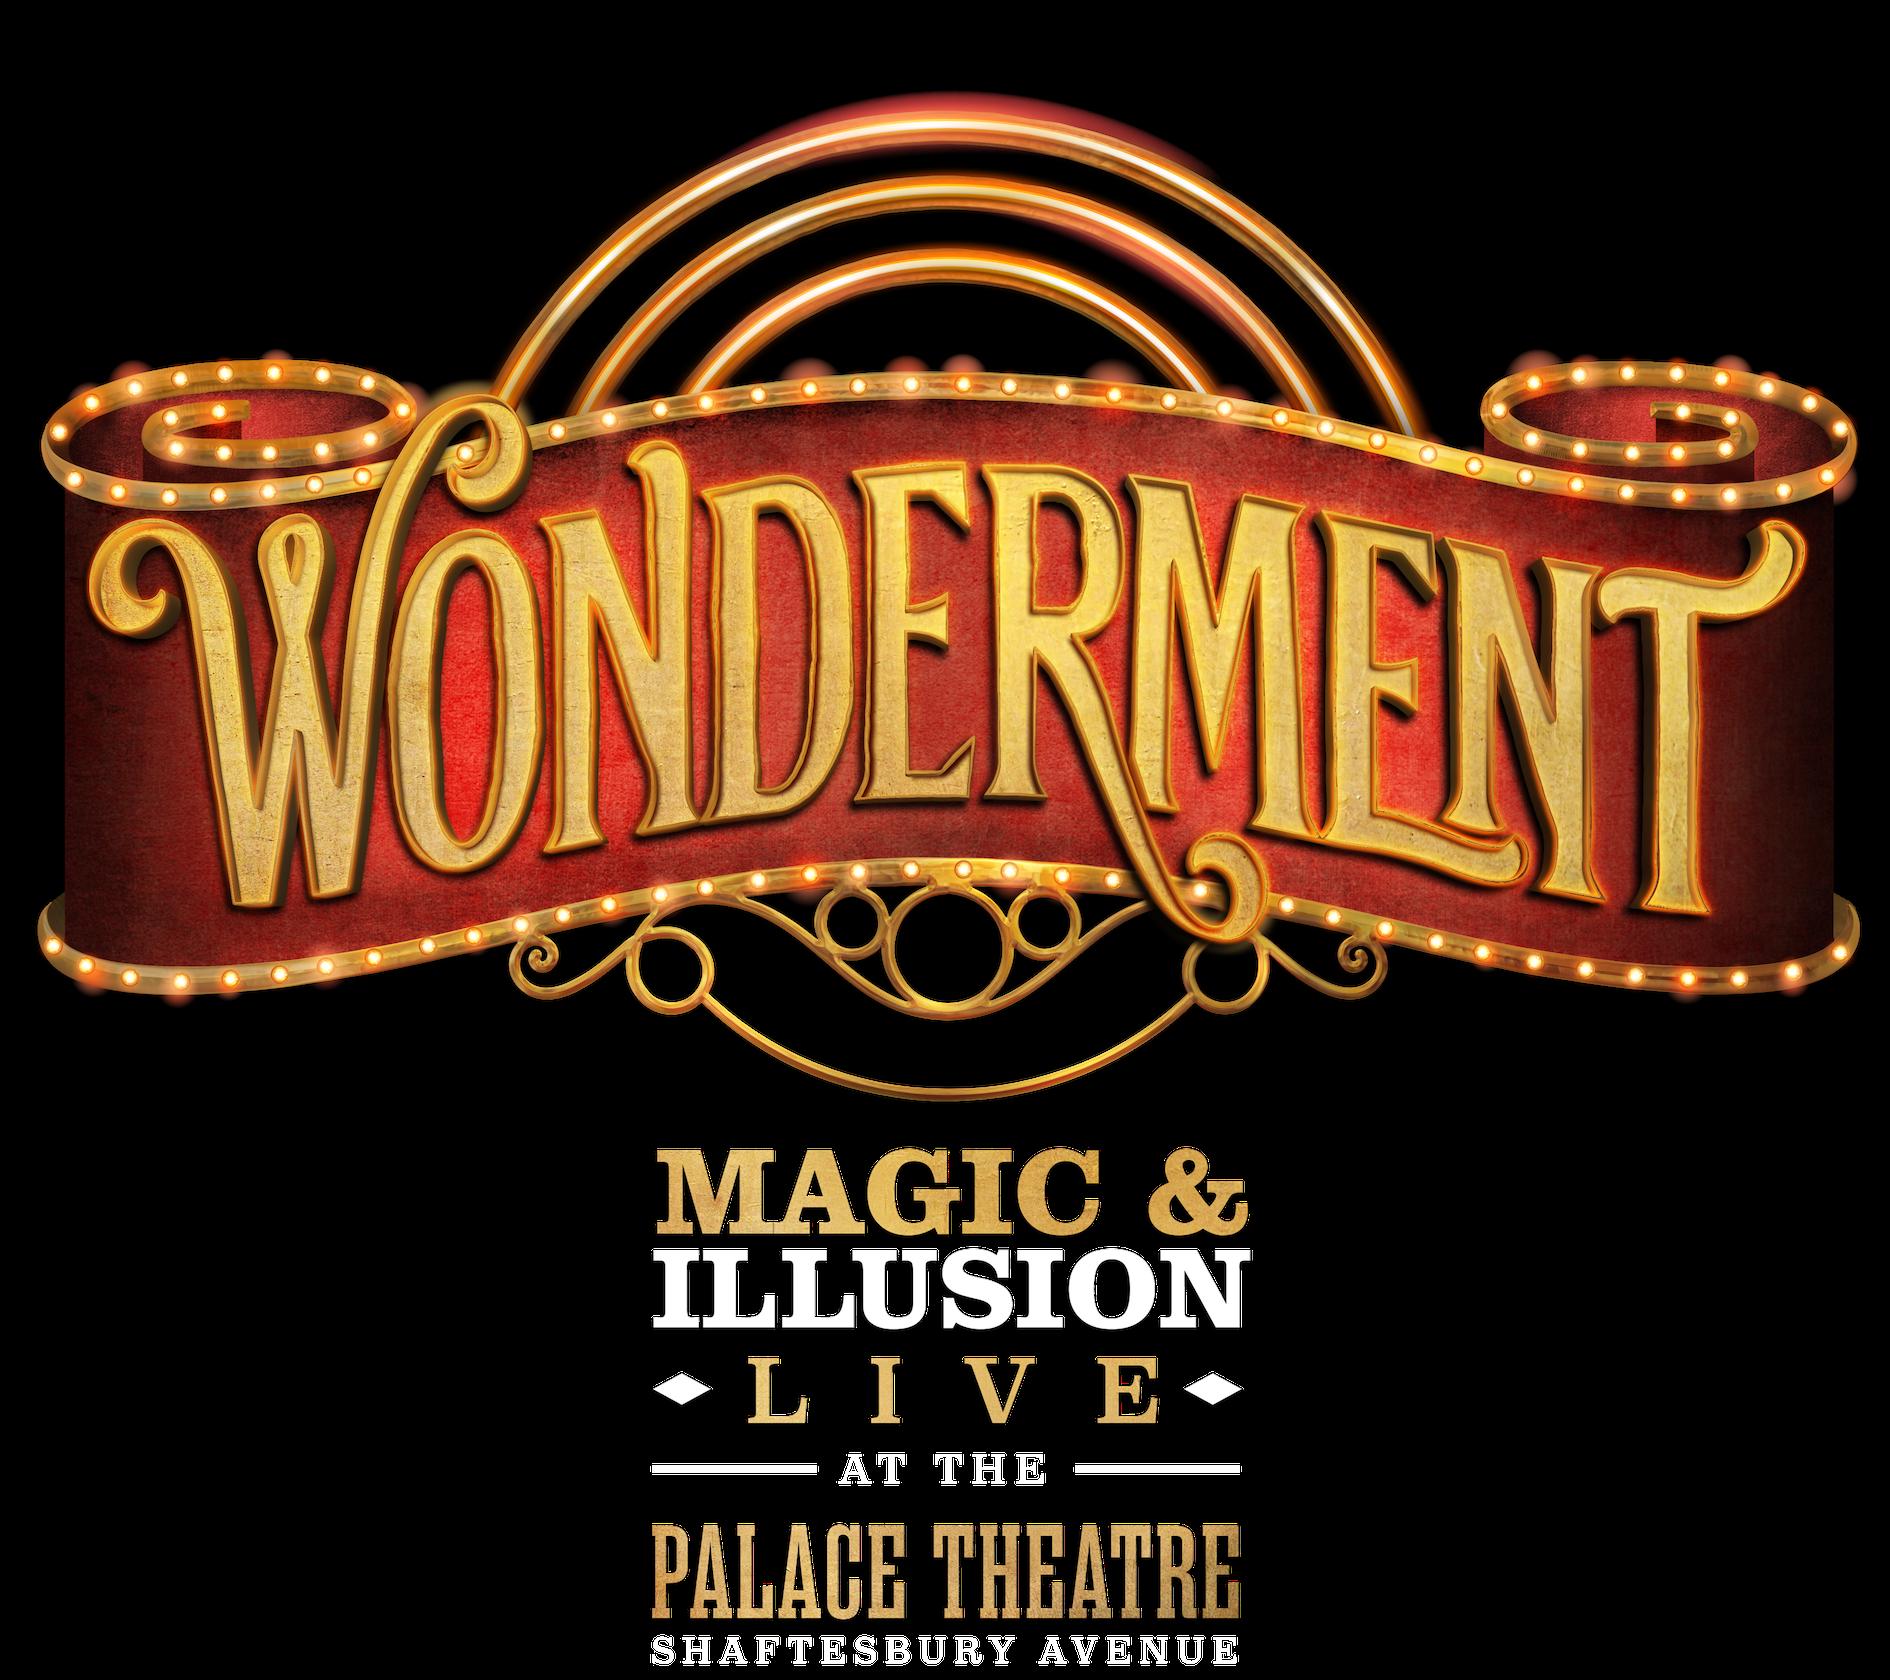 Wonderment - Magic & Illusion Live